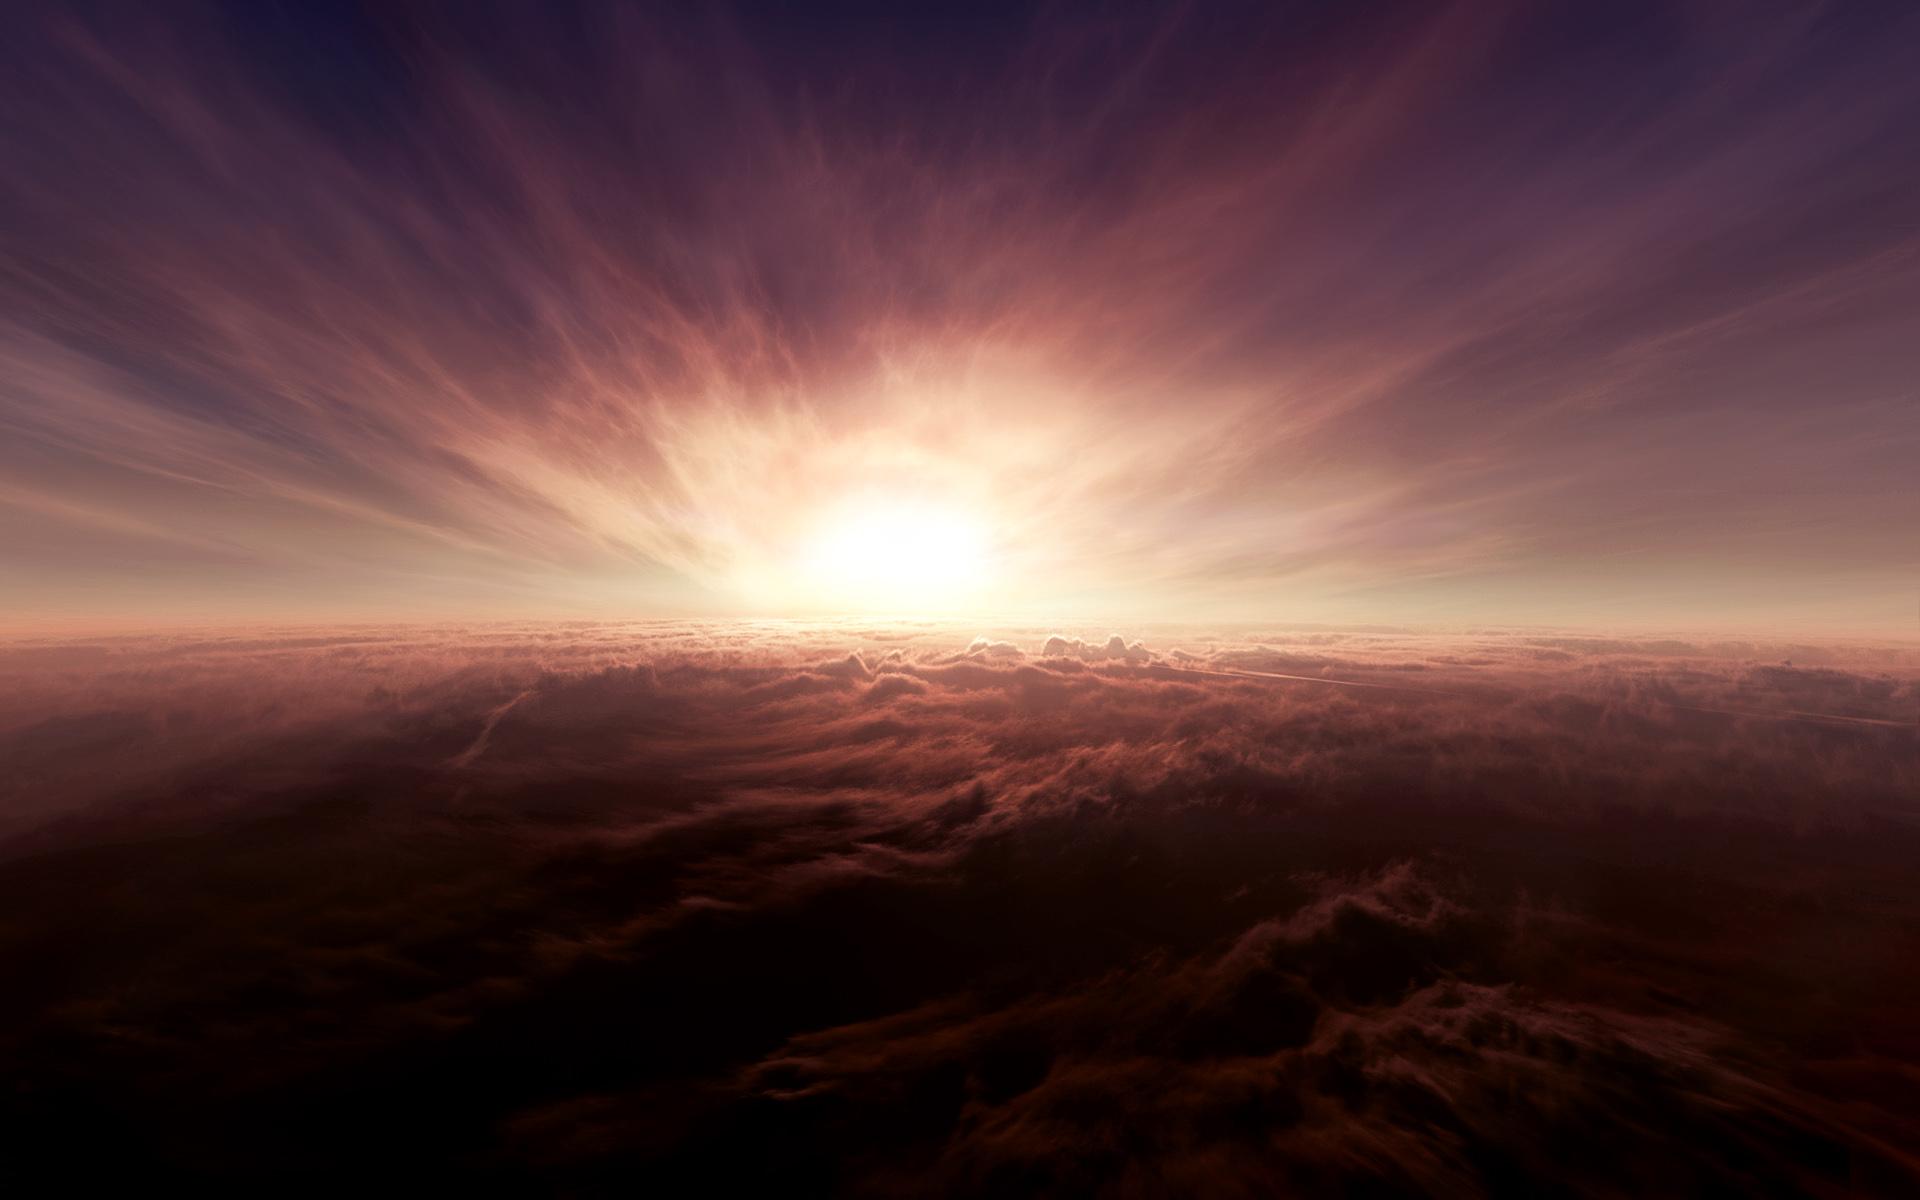 Cloud Wallpapers Amazing Hd Desktop Wallpapers 4k Hd